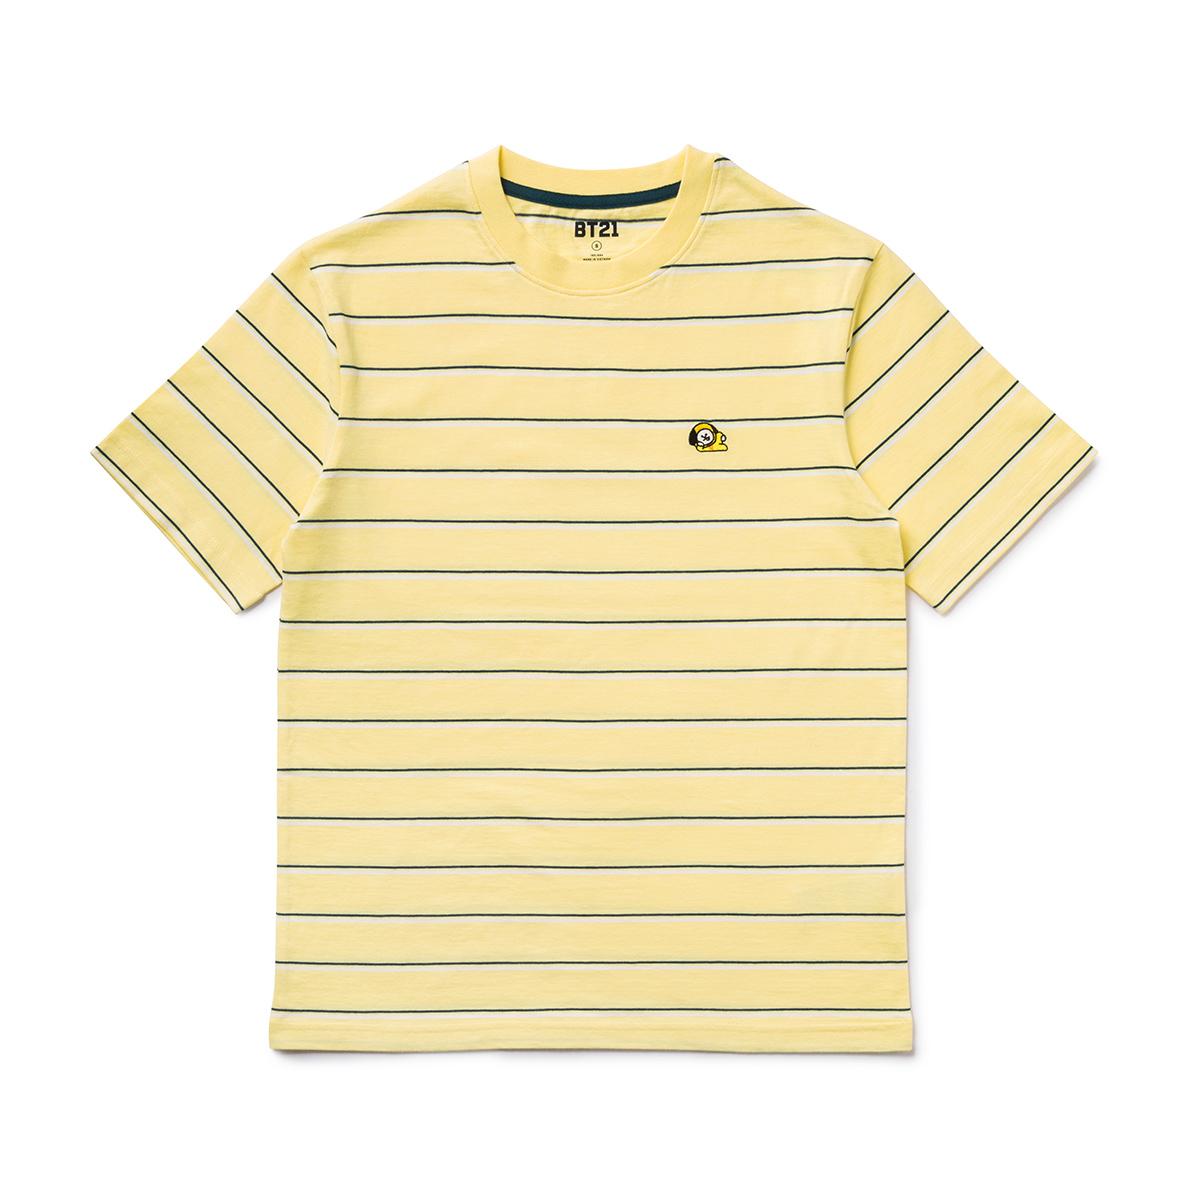 BT21 CHIMMY 베이직 스트라이프 반팔 티셔츠